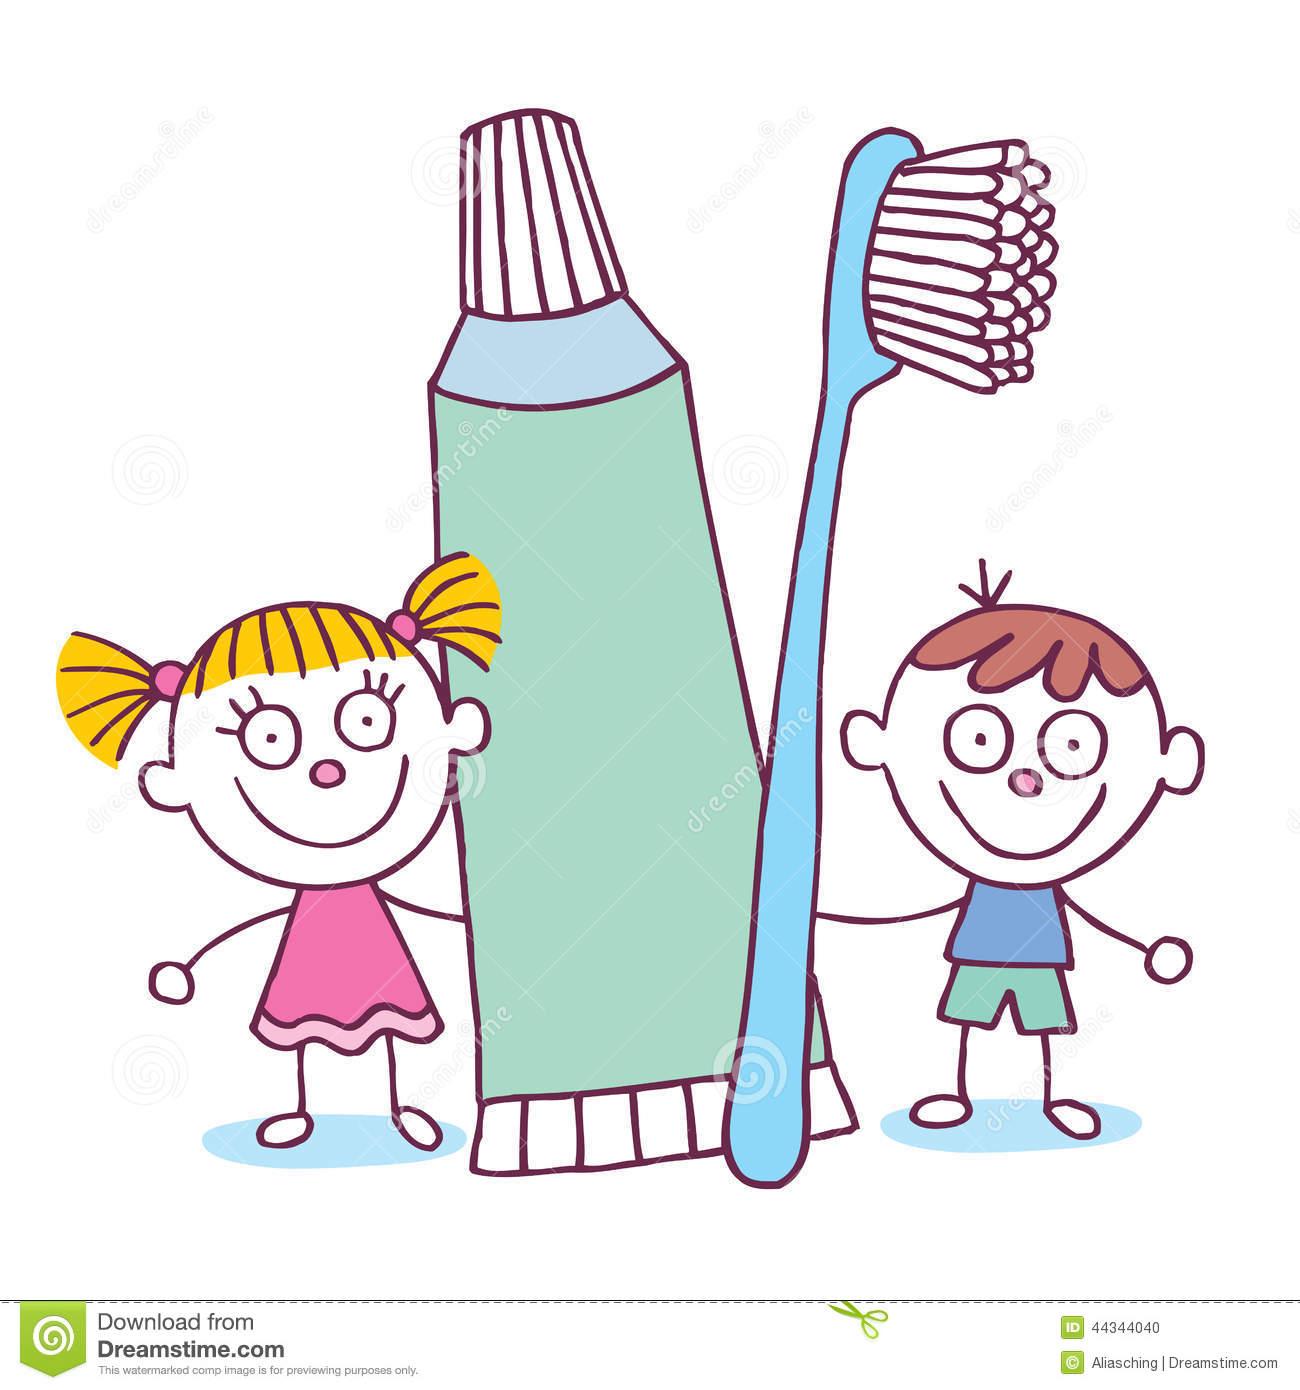 Dental Hygienist Clipart - Clipart Kid